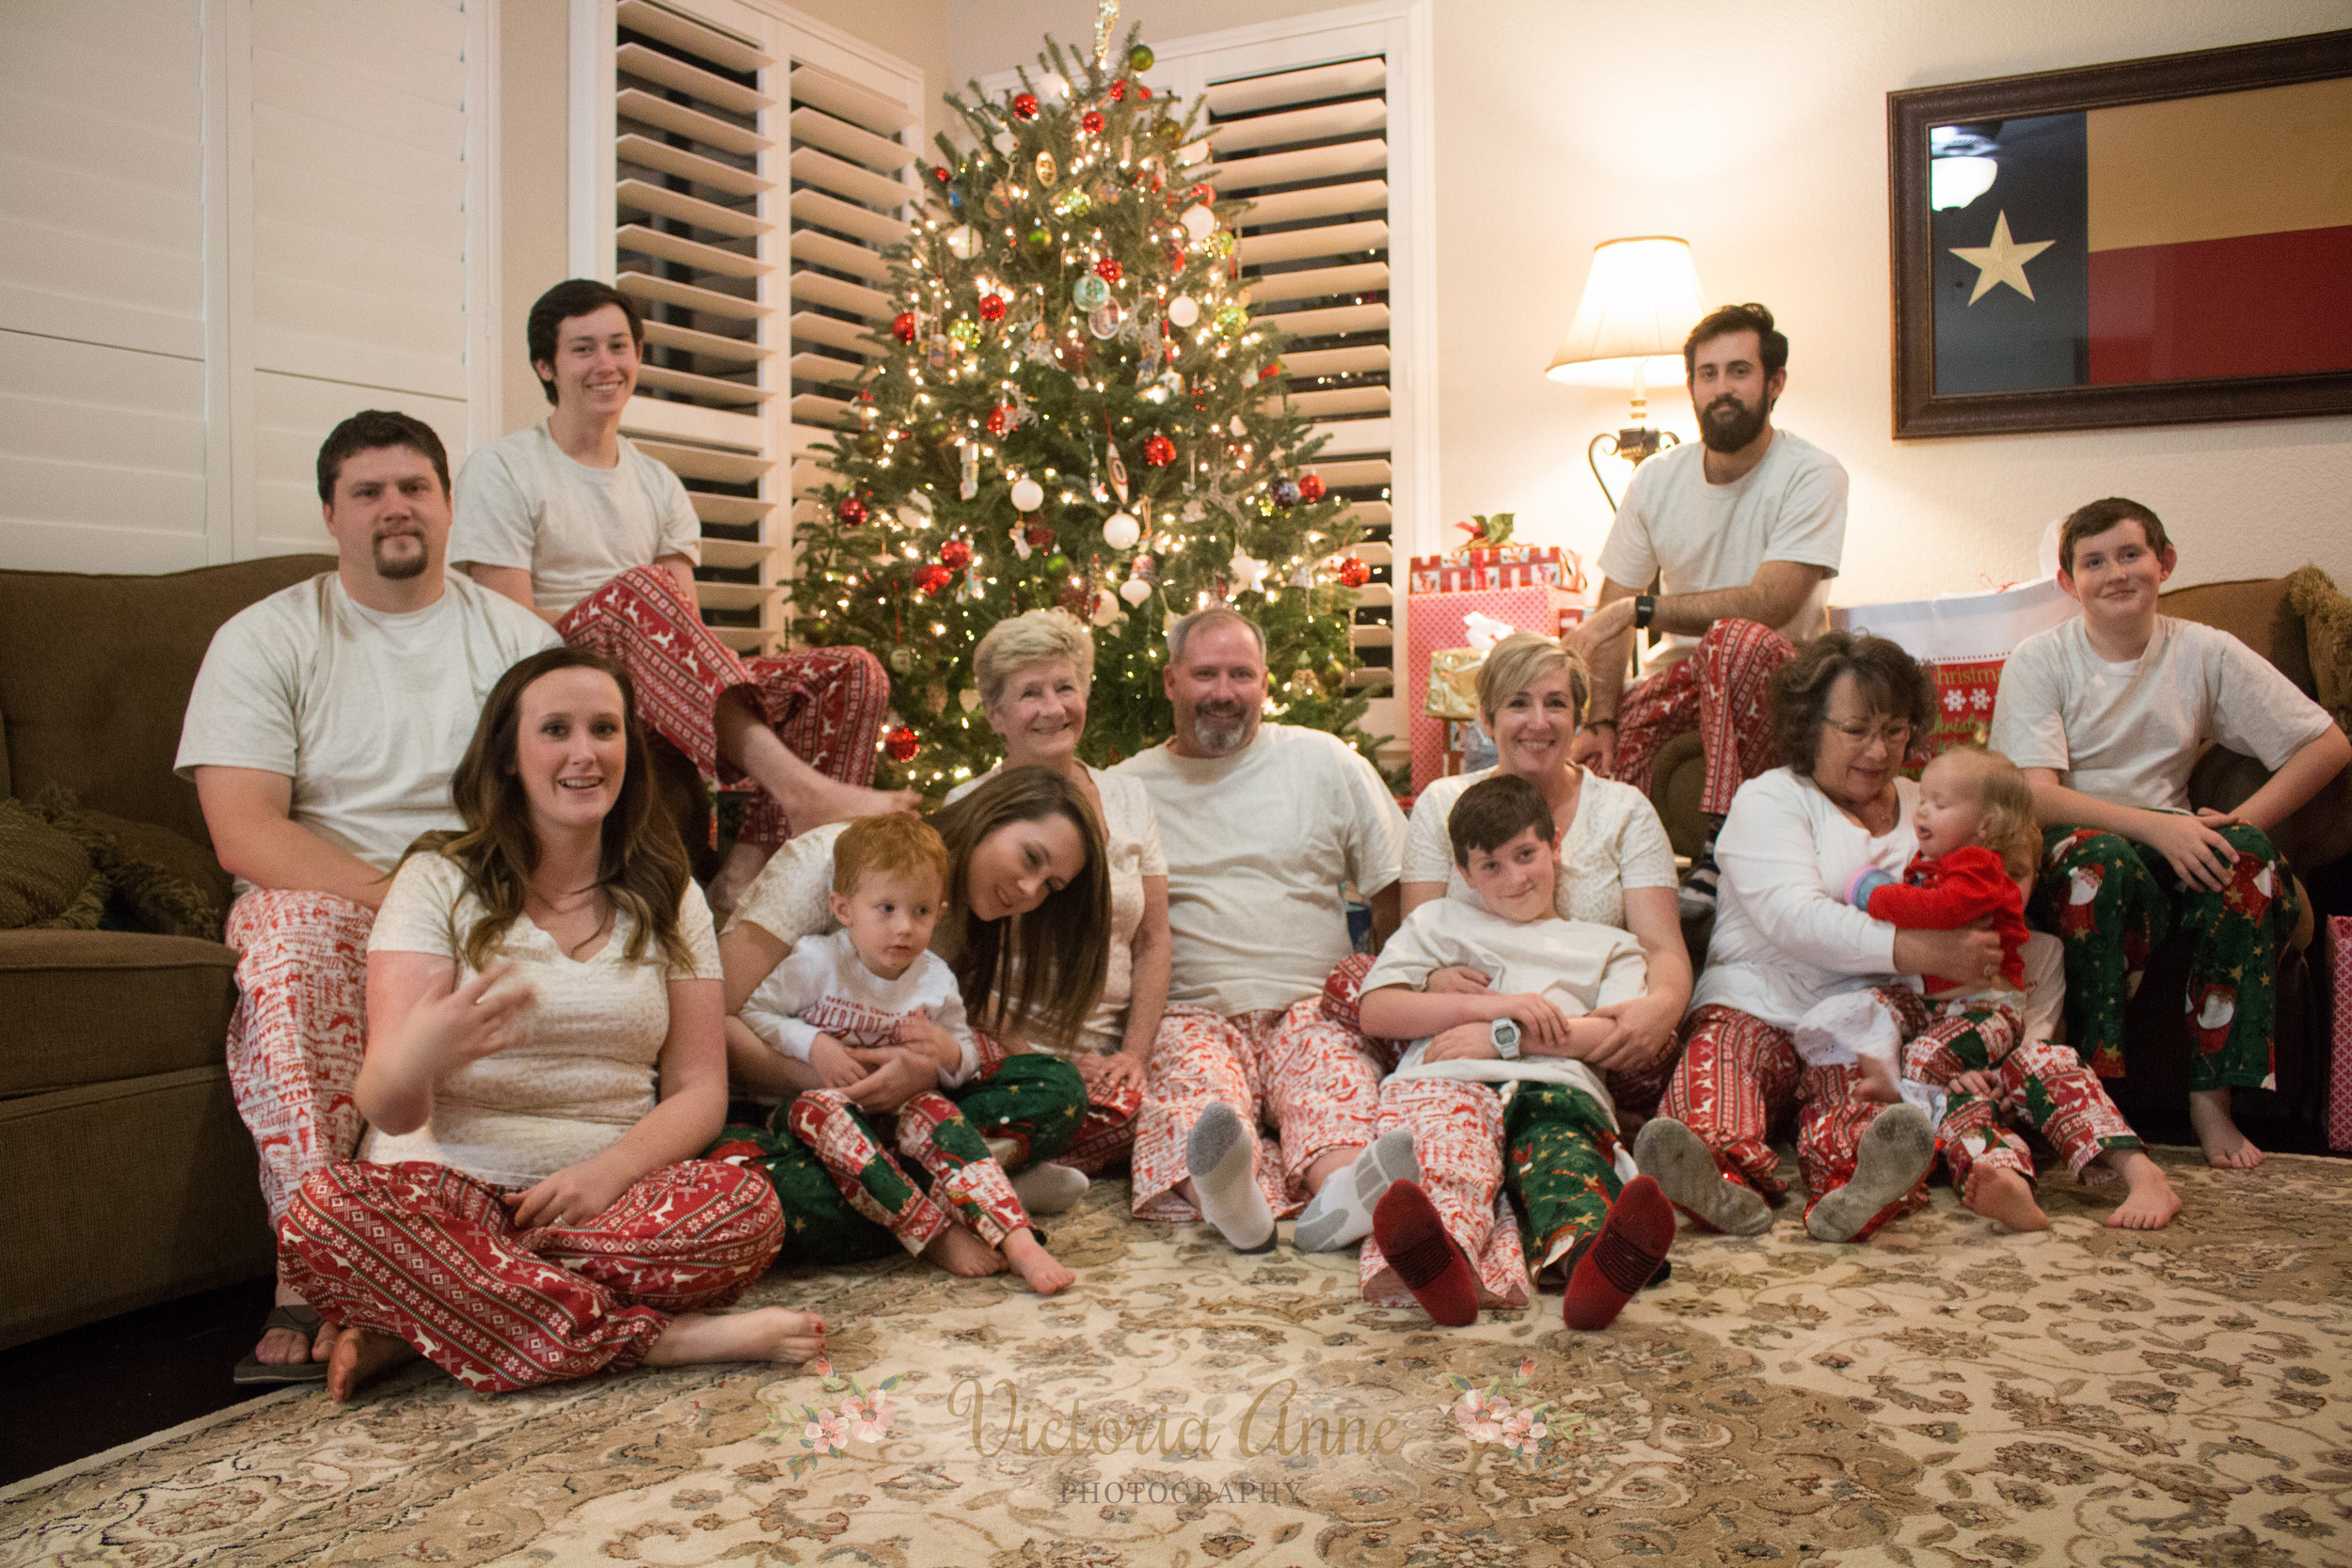 Family Christmas PJ selfie